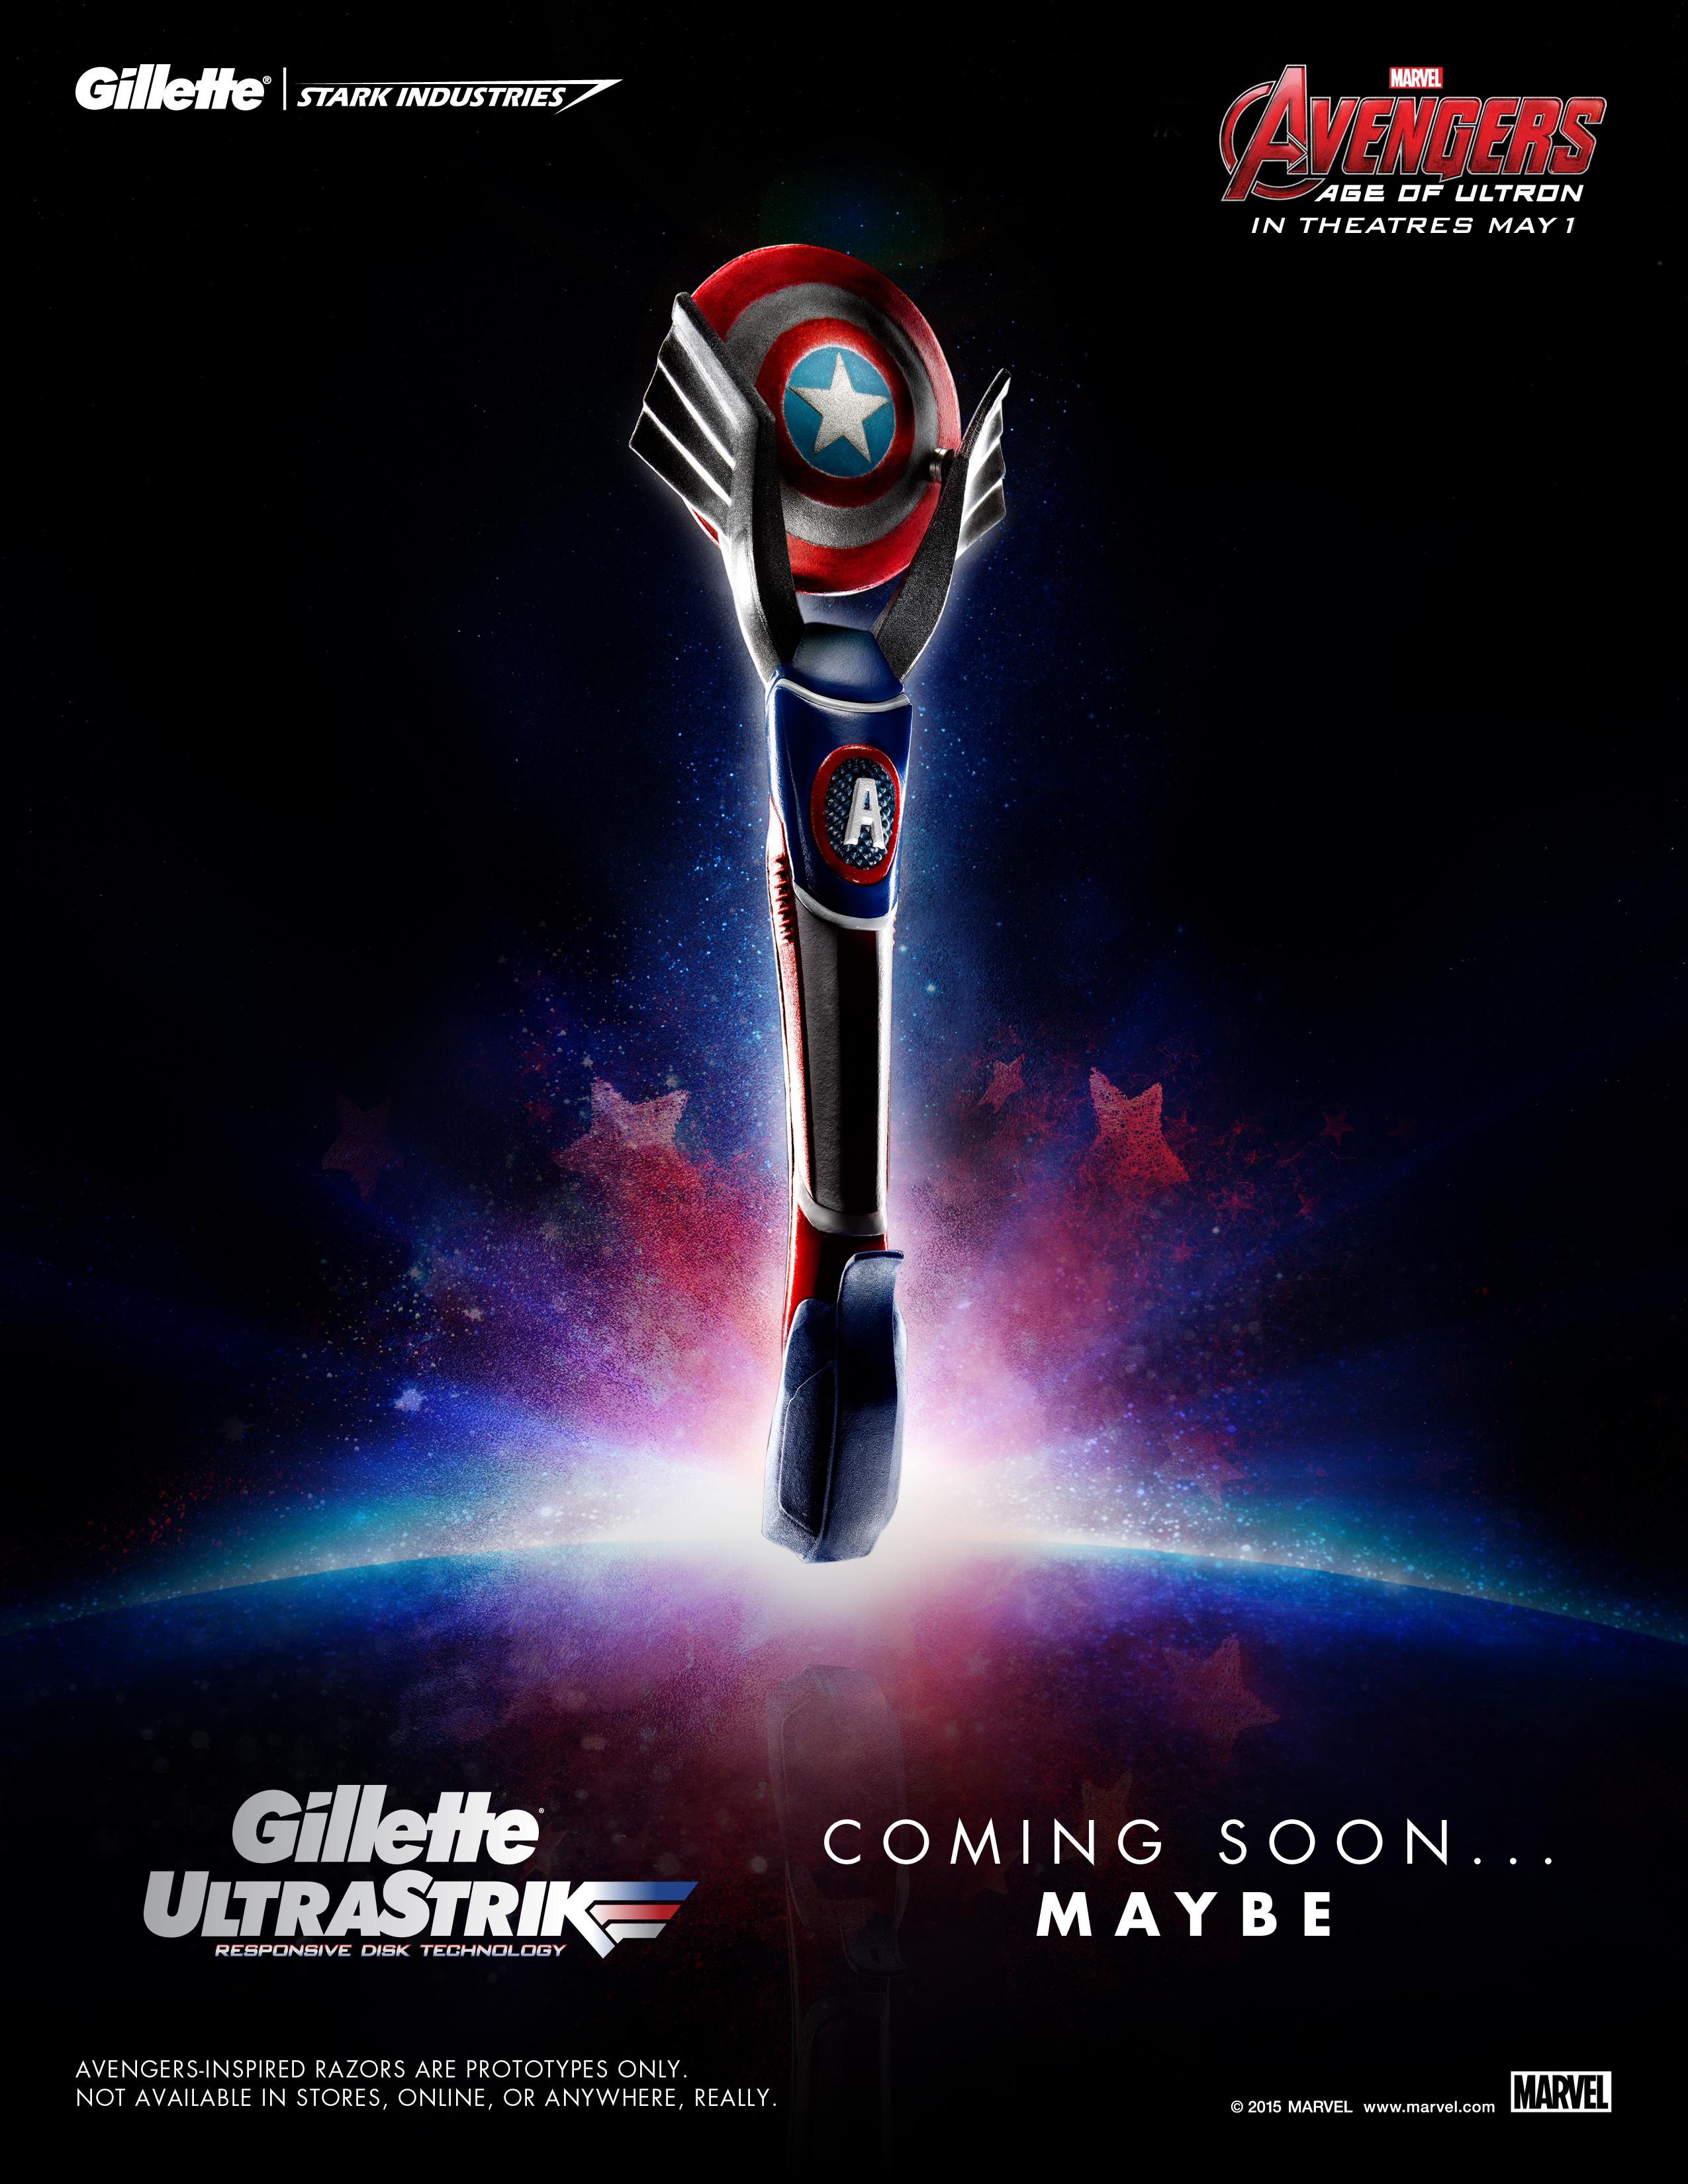 Gillette Avengers_Color_ALL_r4